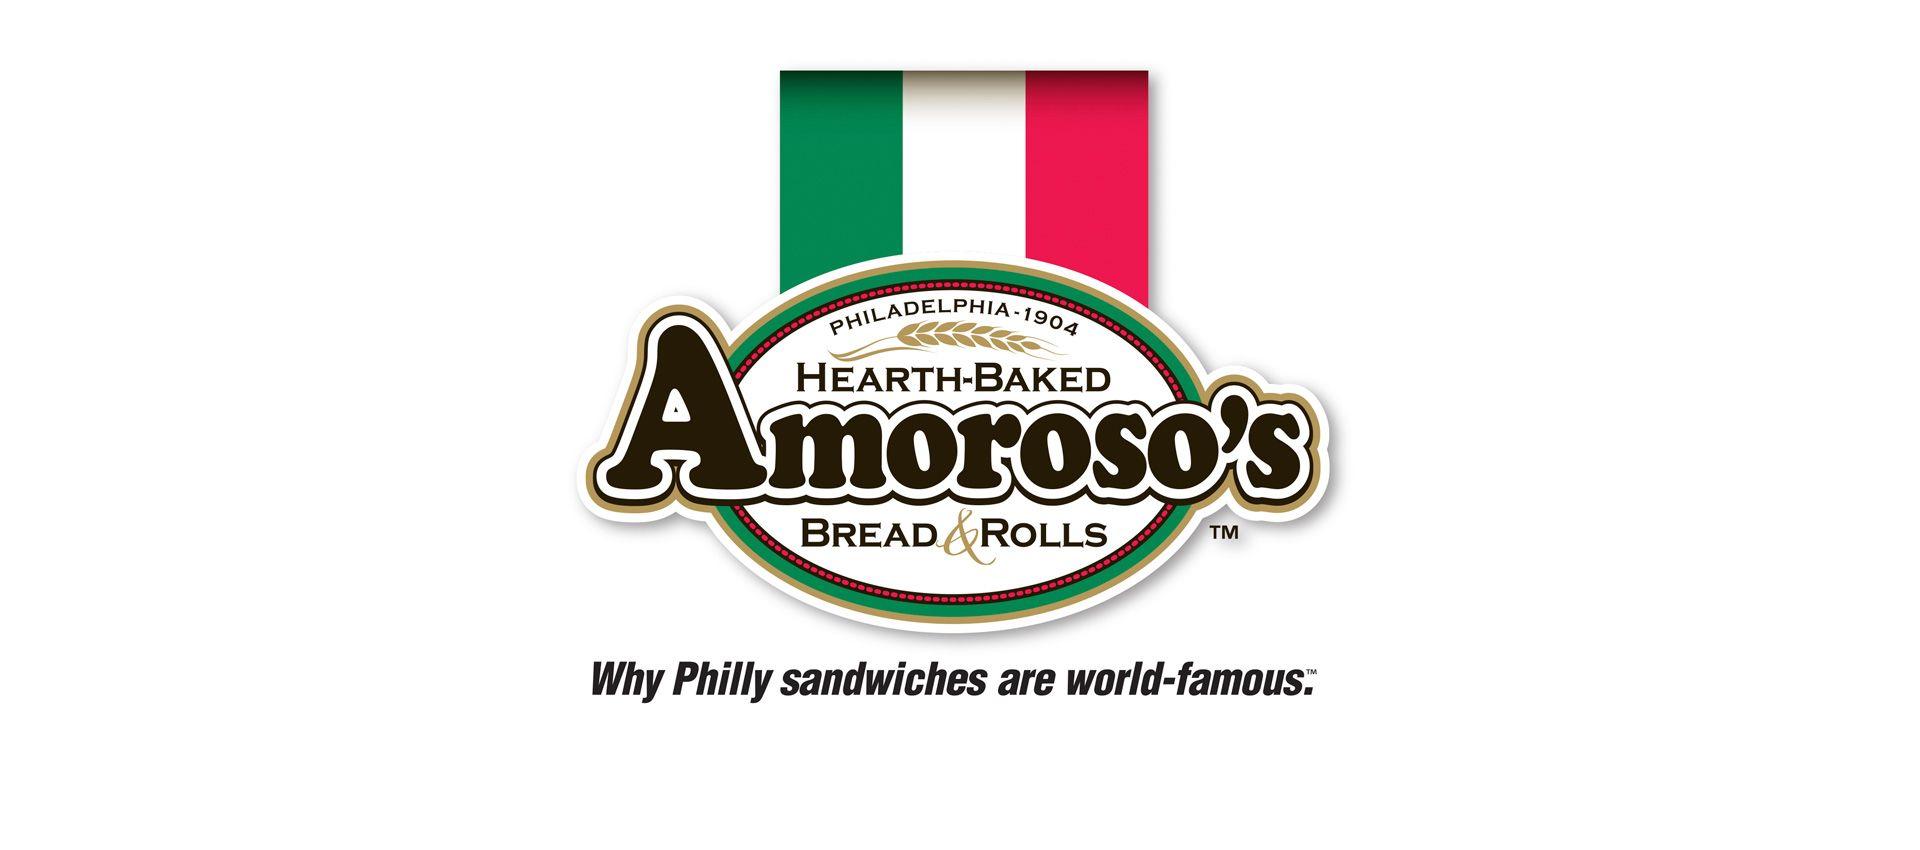 Amoroso's is still rolling